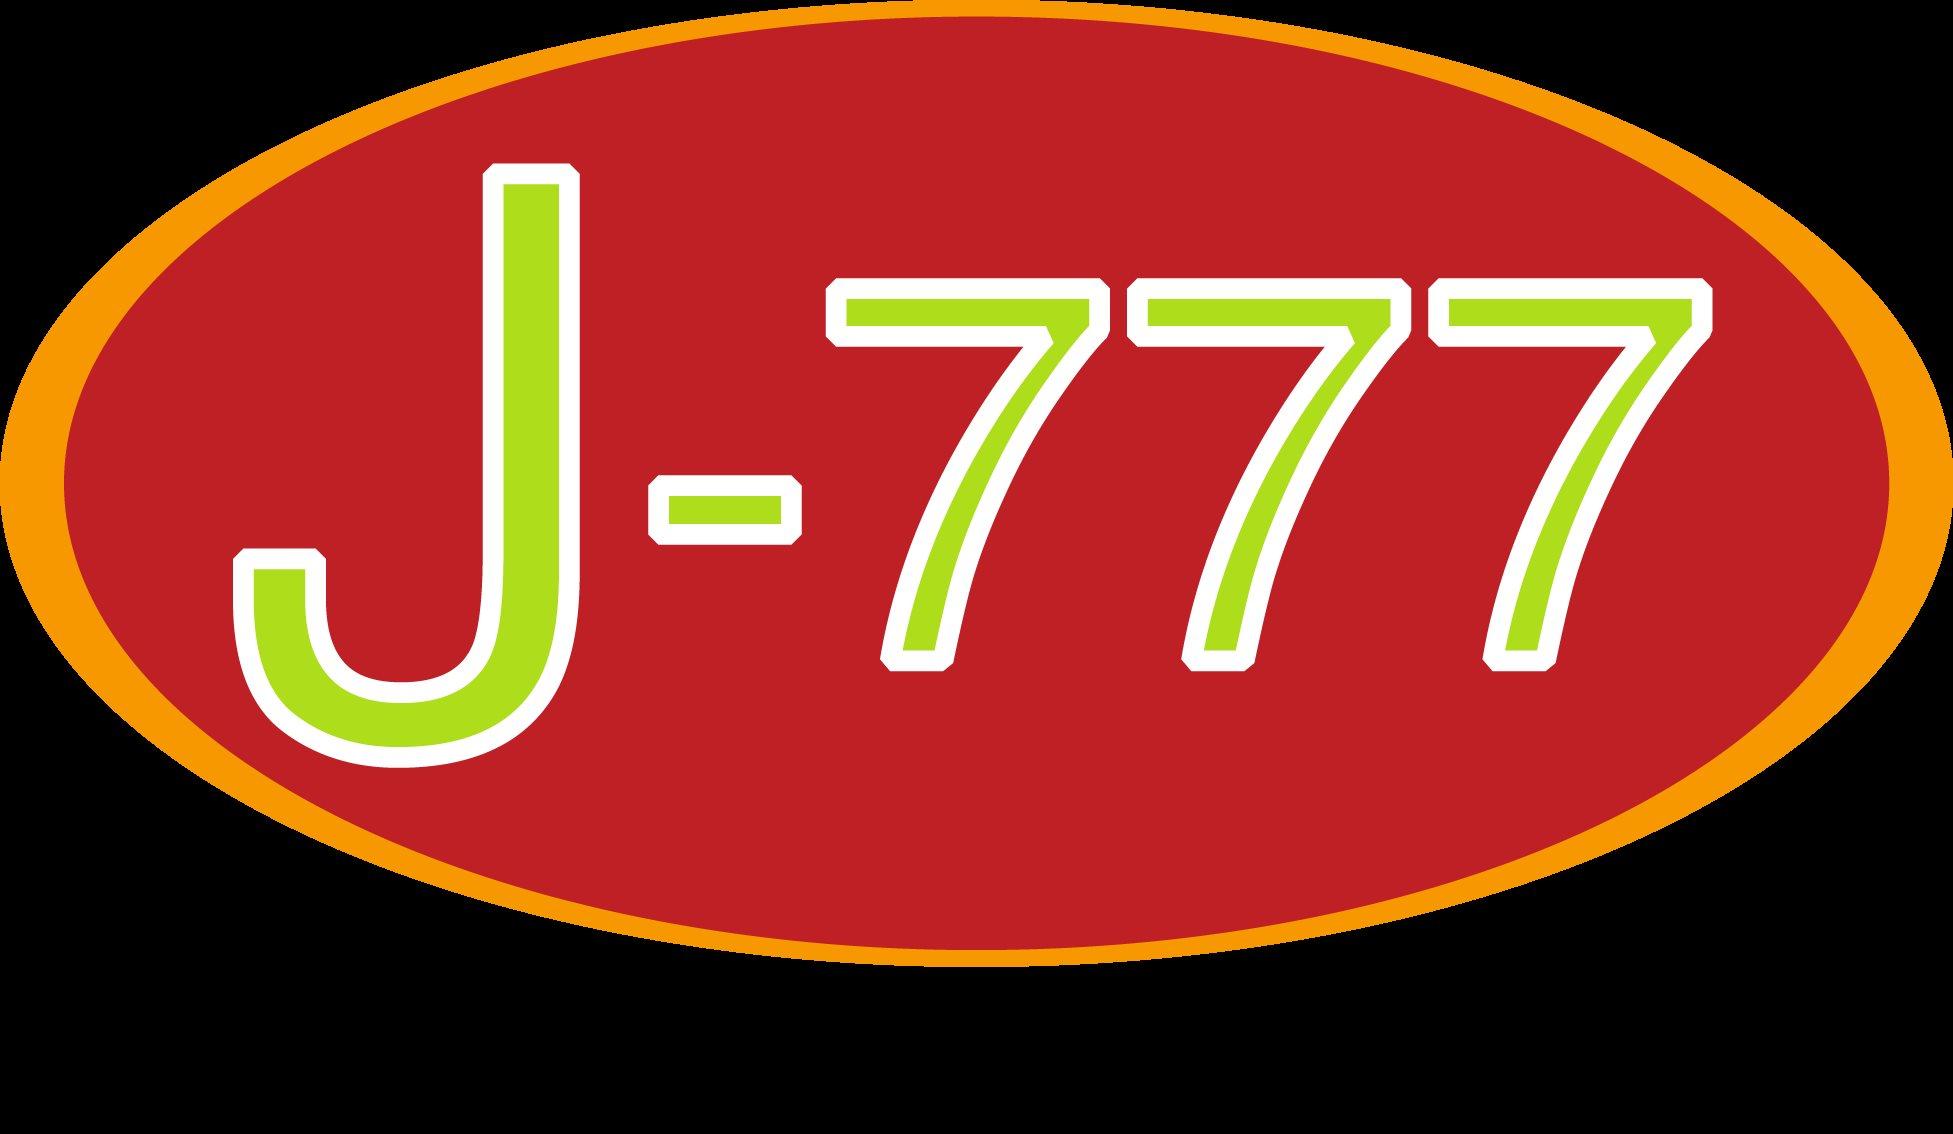 J777 AgriMarketing Corp.